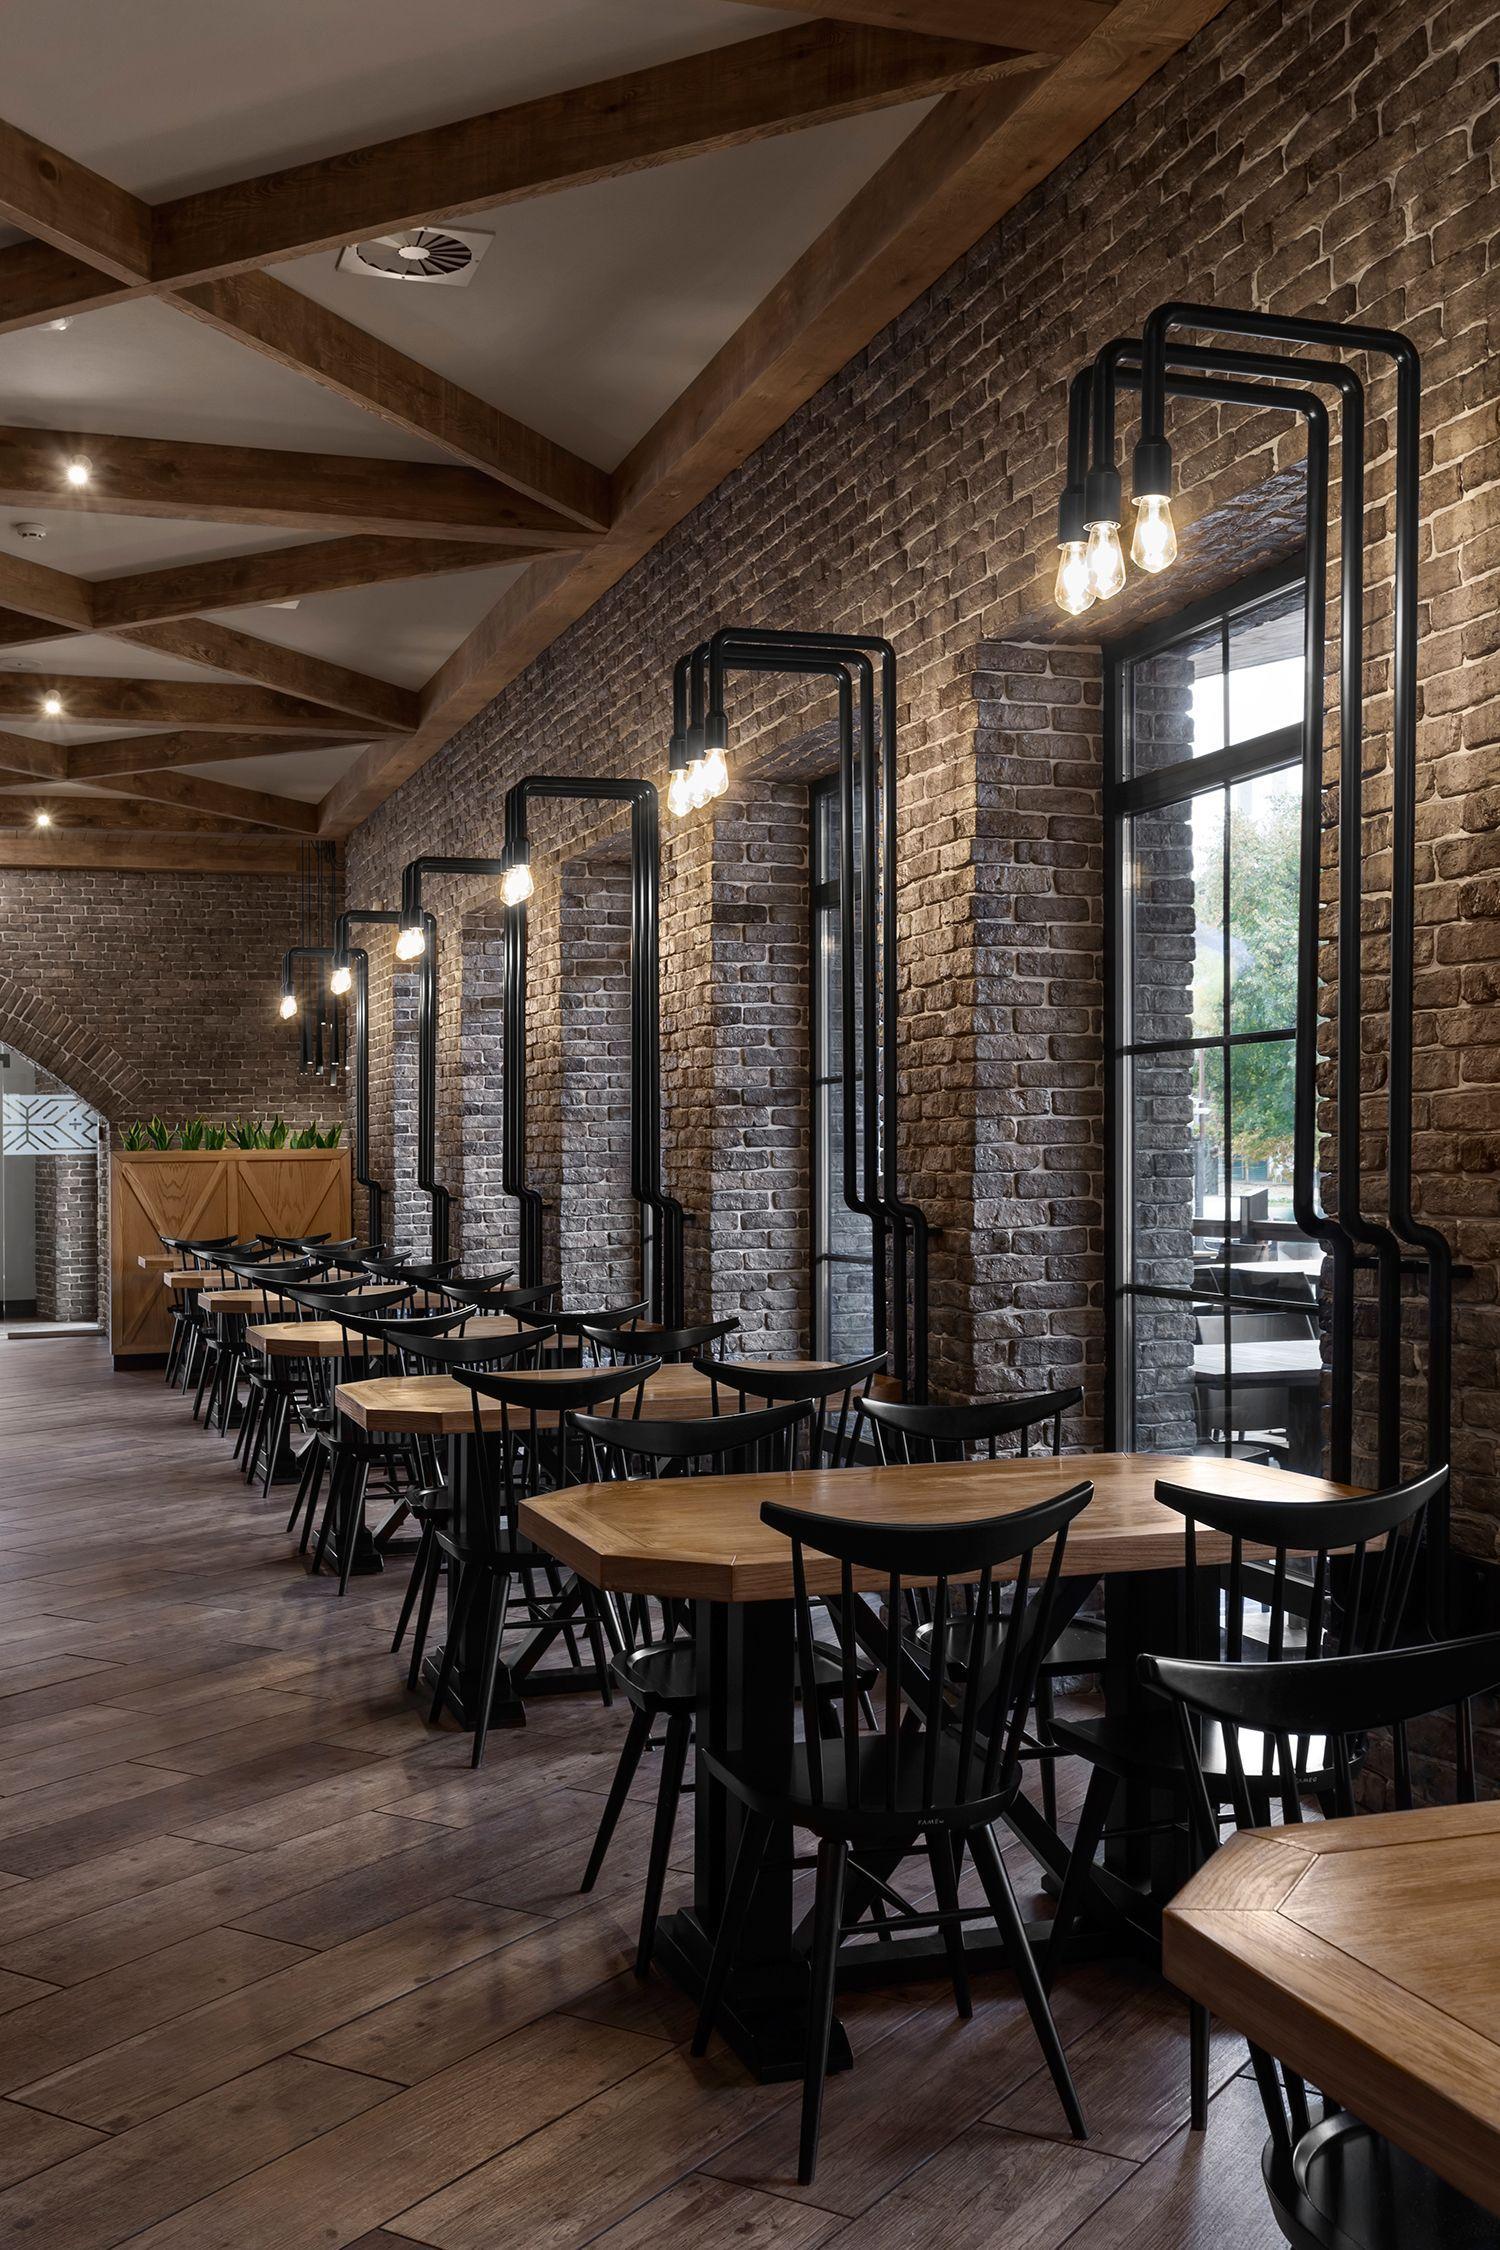 Lighting Designs You Ll Love For Your Home Decor Www Lightingstores Eu Restaurant Interior Design Cafe Interior Design Bar Interior Design